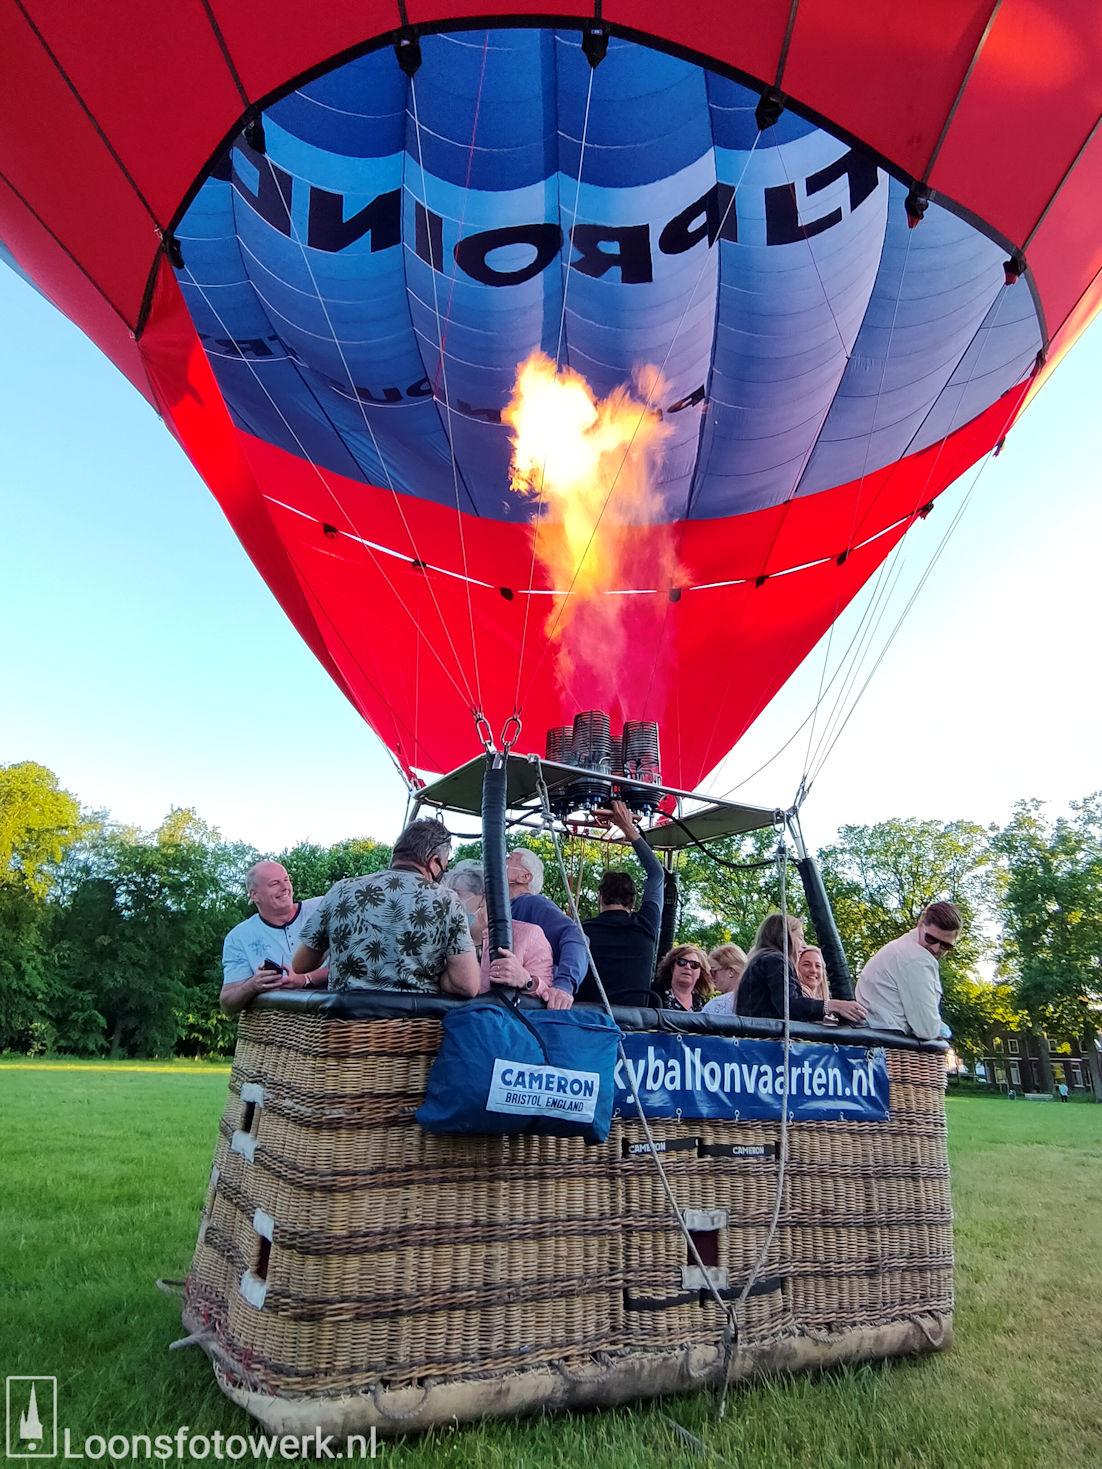 Ballonvaart vanaf de Kasteelweide 25